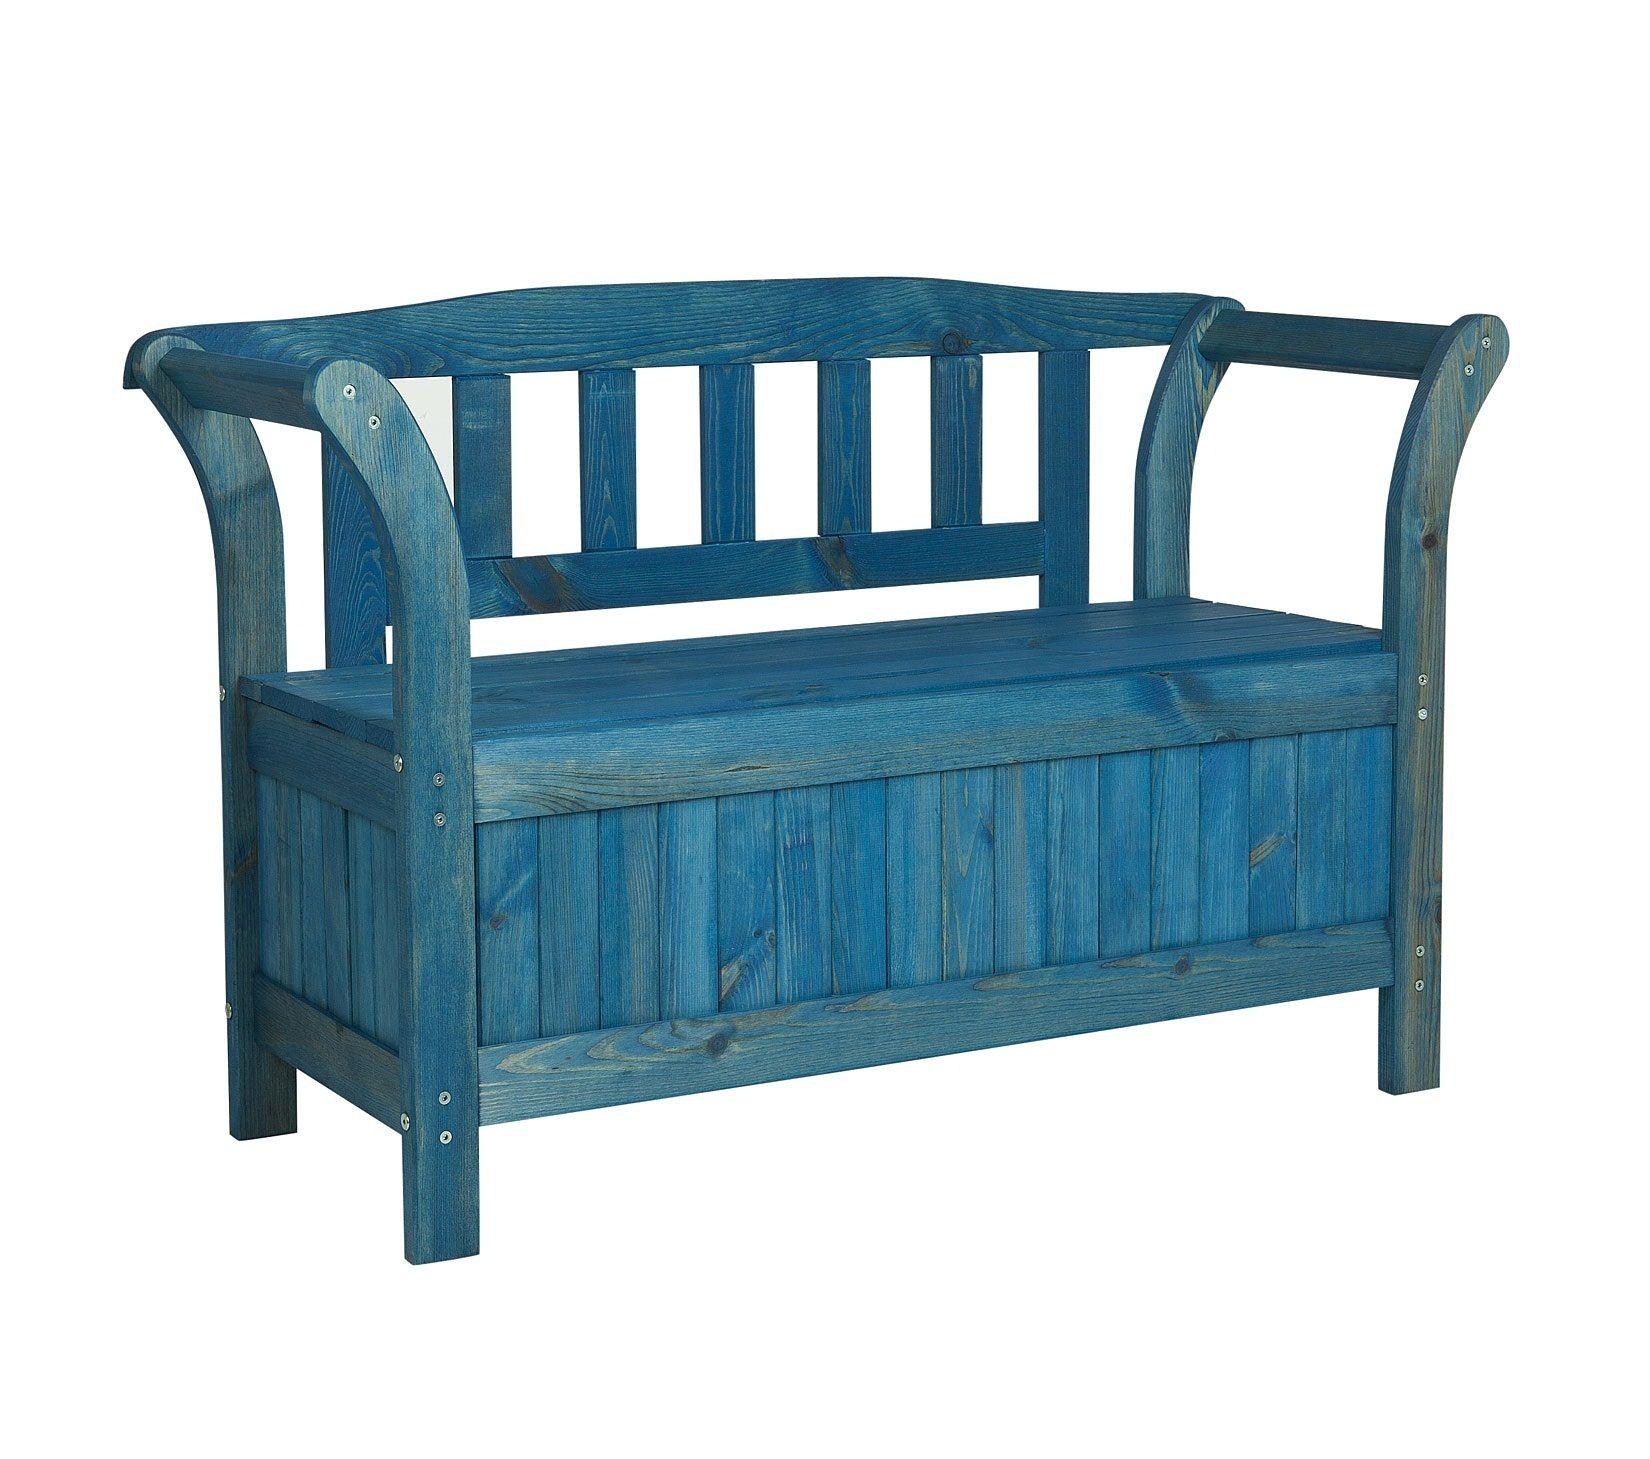 details zu gartenbank truhenbank friesenbank holzbank. Black Bedroom Furniture Sets. Home Design Ideas